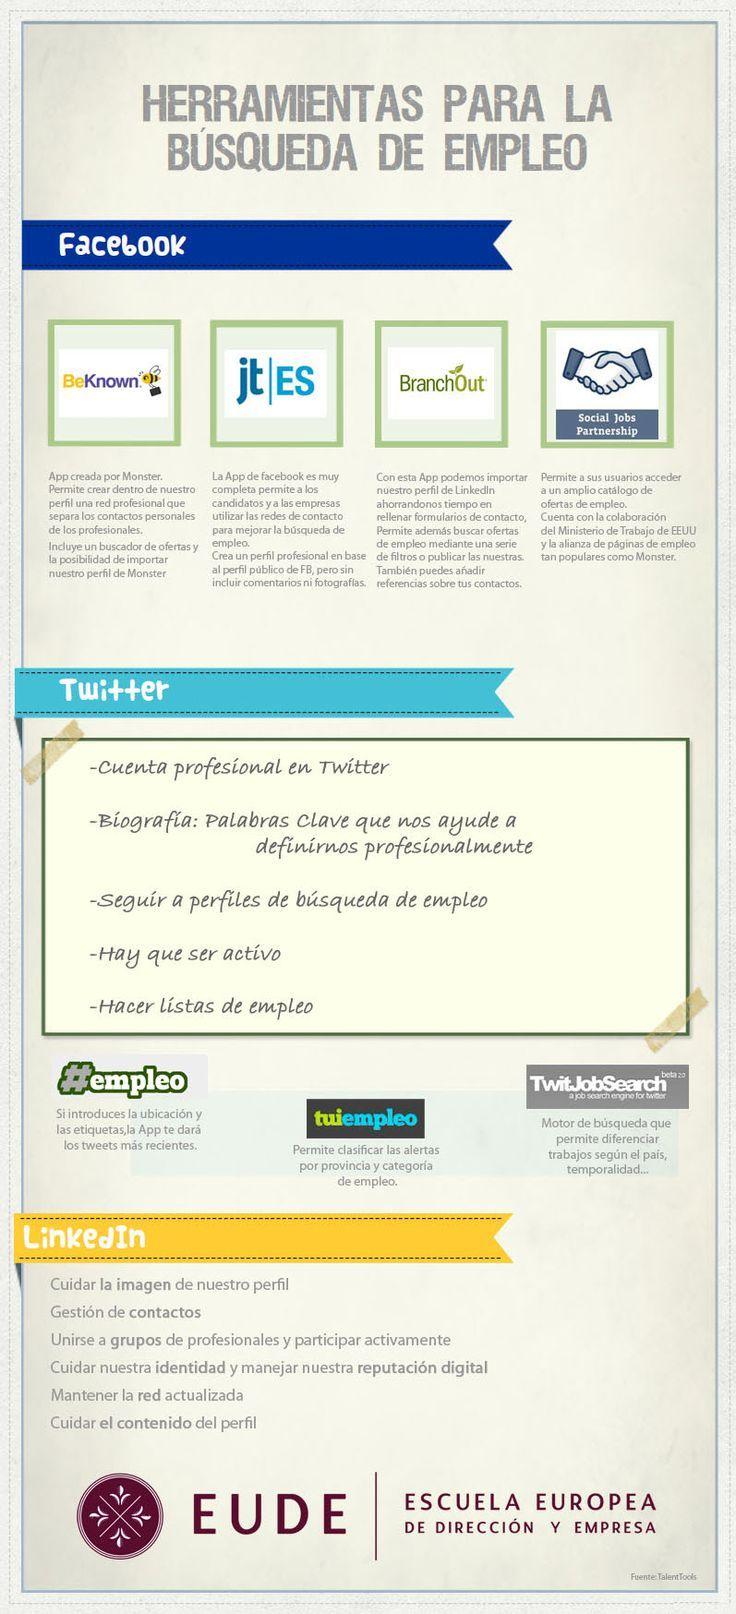 Mejores 66 imágenes de Búsqueda de empleo en Pinterest   Busco ...